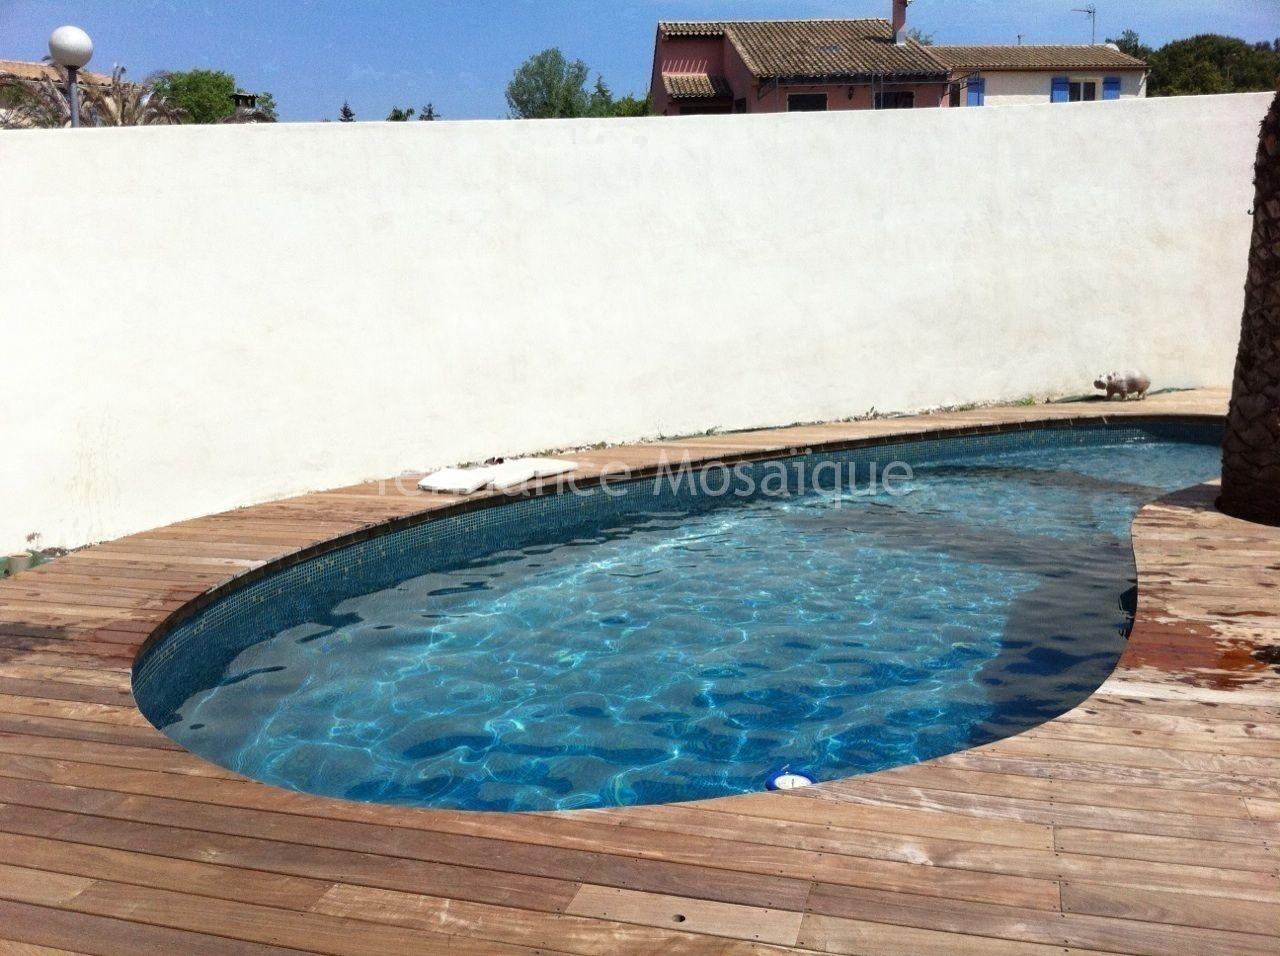 Piscine p te de verre dolce mosaic r f rence delia bleu jaune - Carrelage piscine pate de verre ...